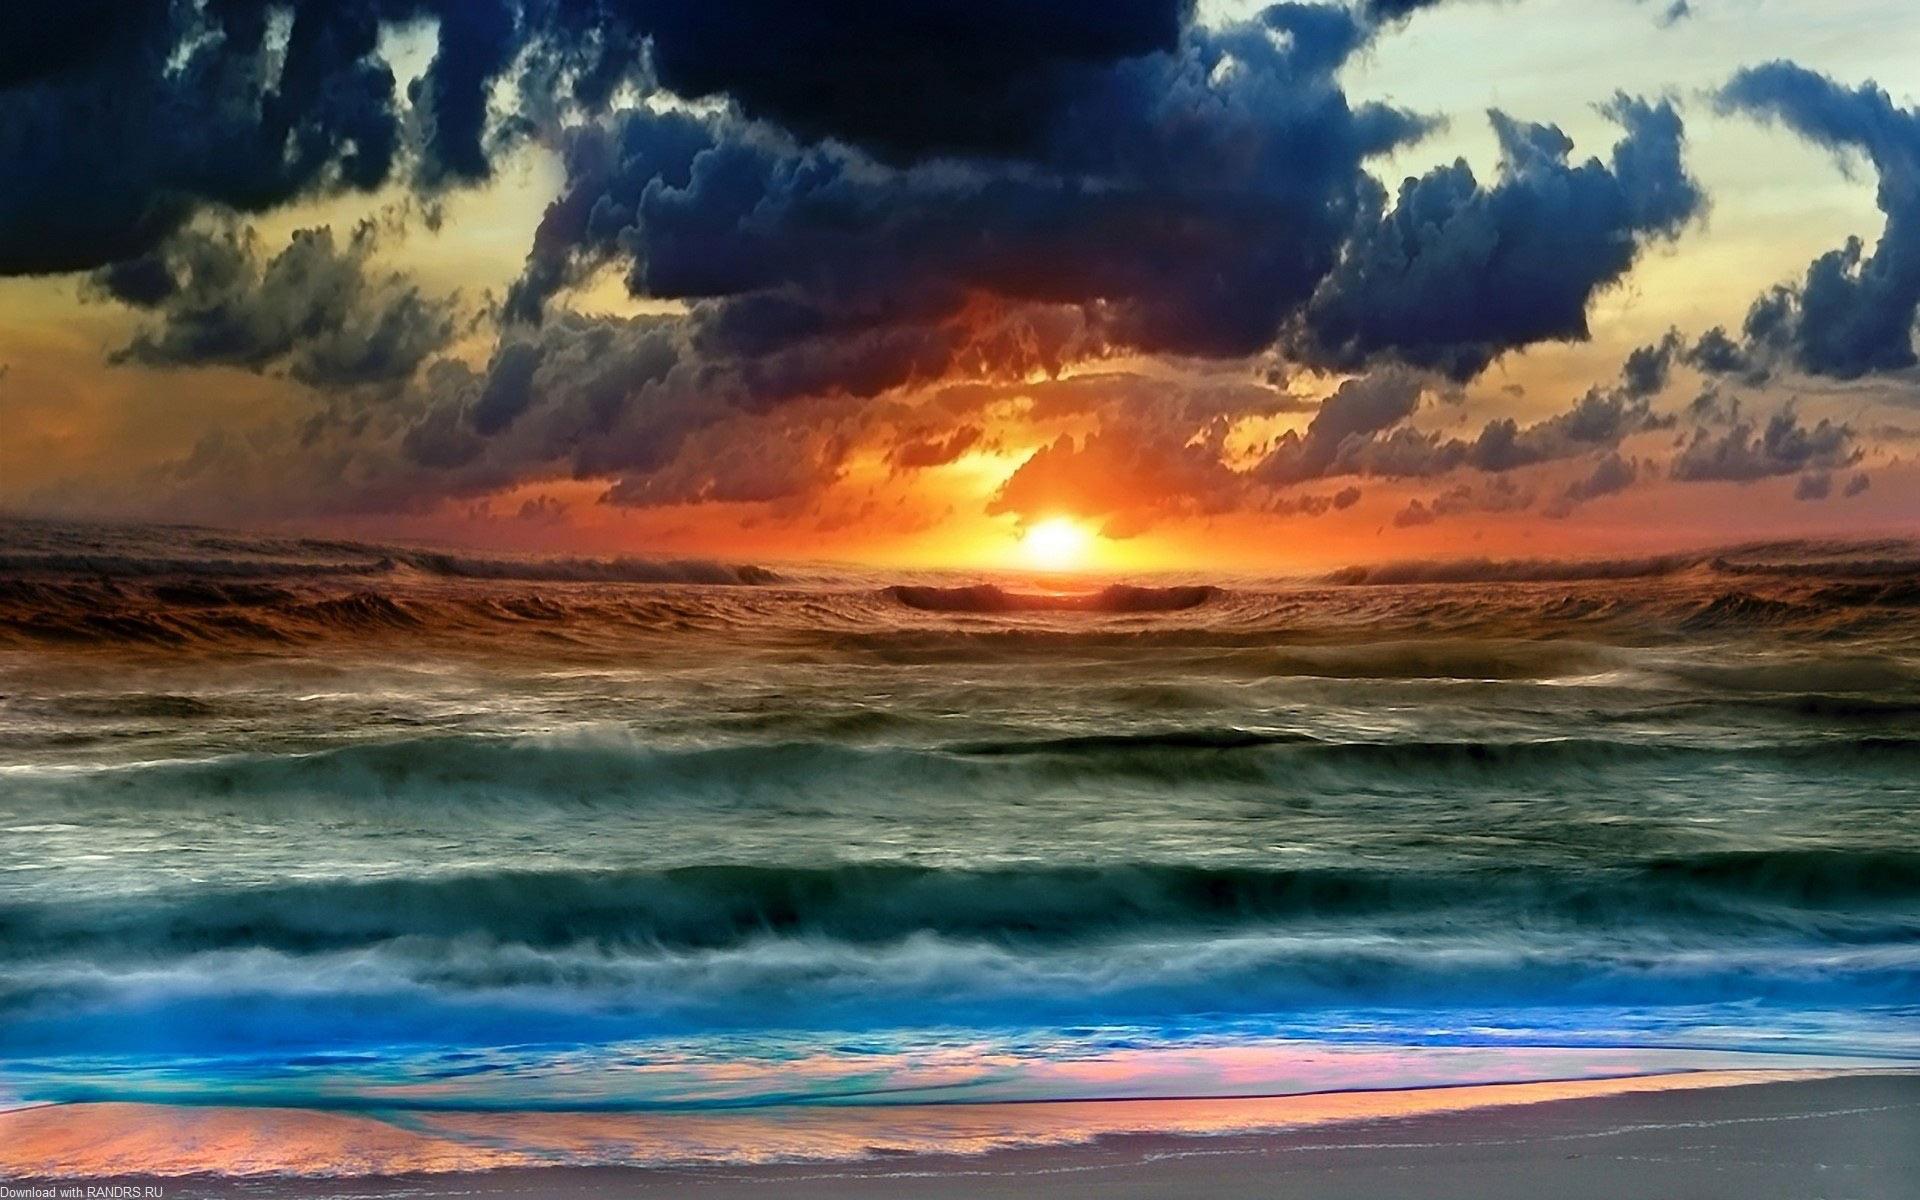 Seascape Pictures